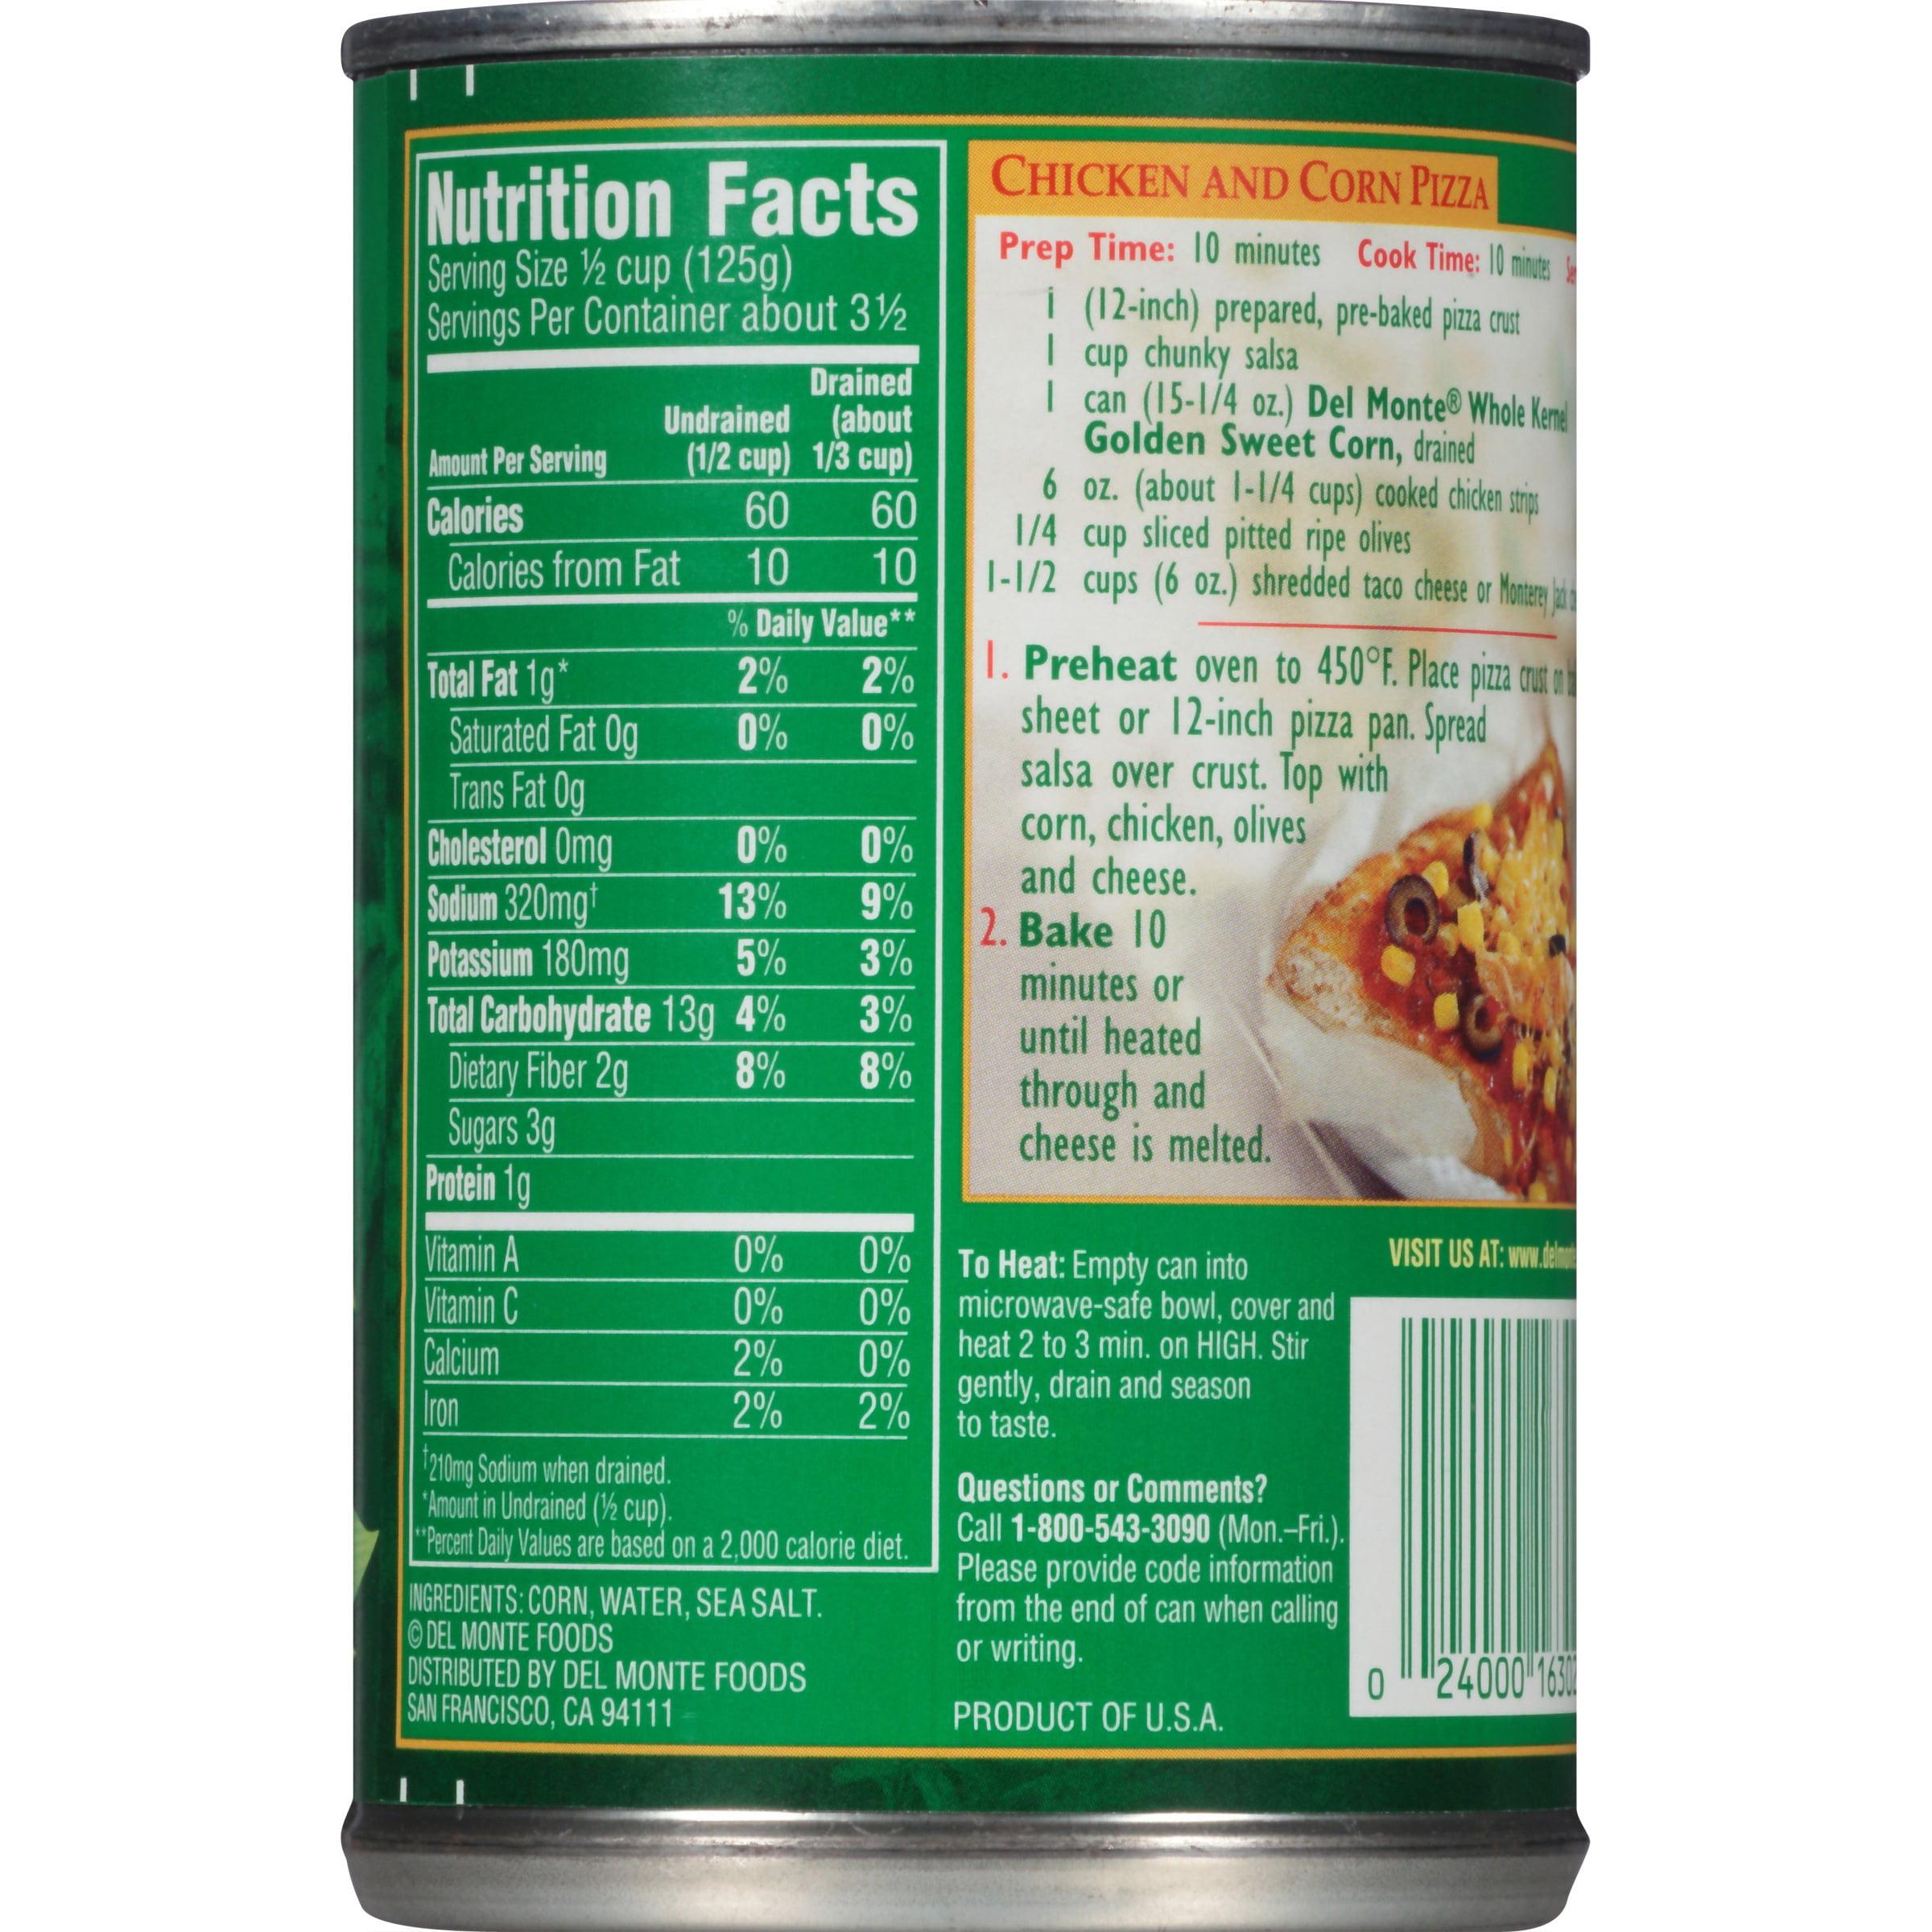 del monte whole kernel golden sweet corn 15 25 oz walmart com